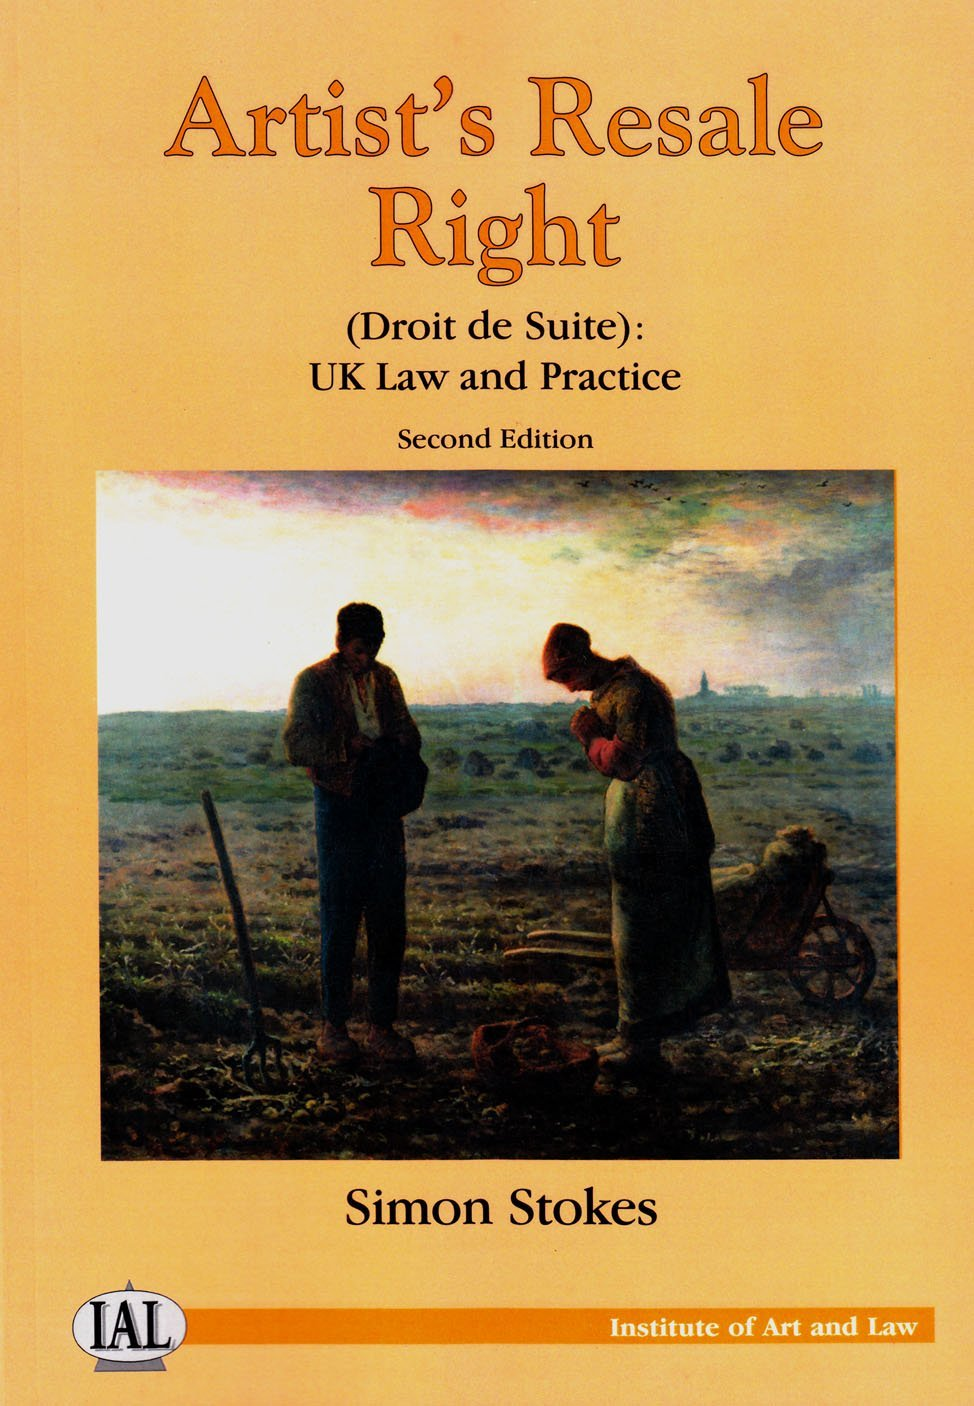 Artists Resale Right (Droit de Suite): UK Law and Practice  by  Simon Stokes